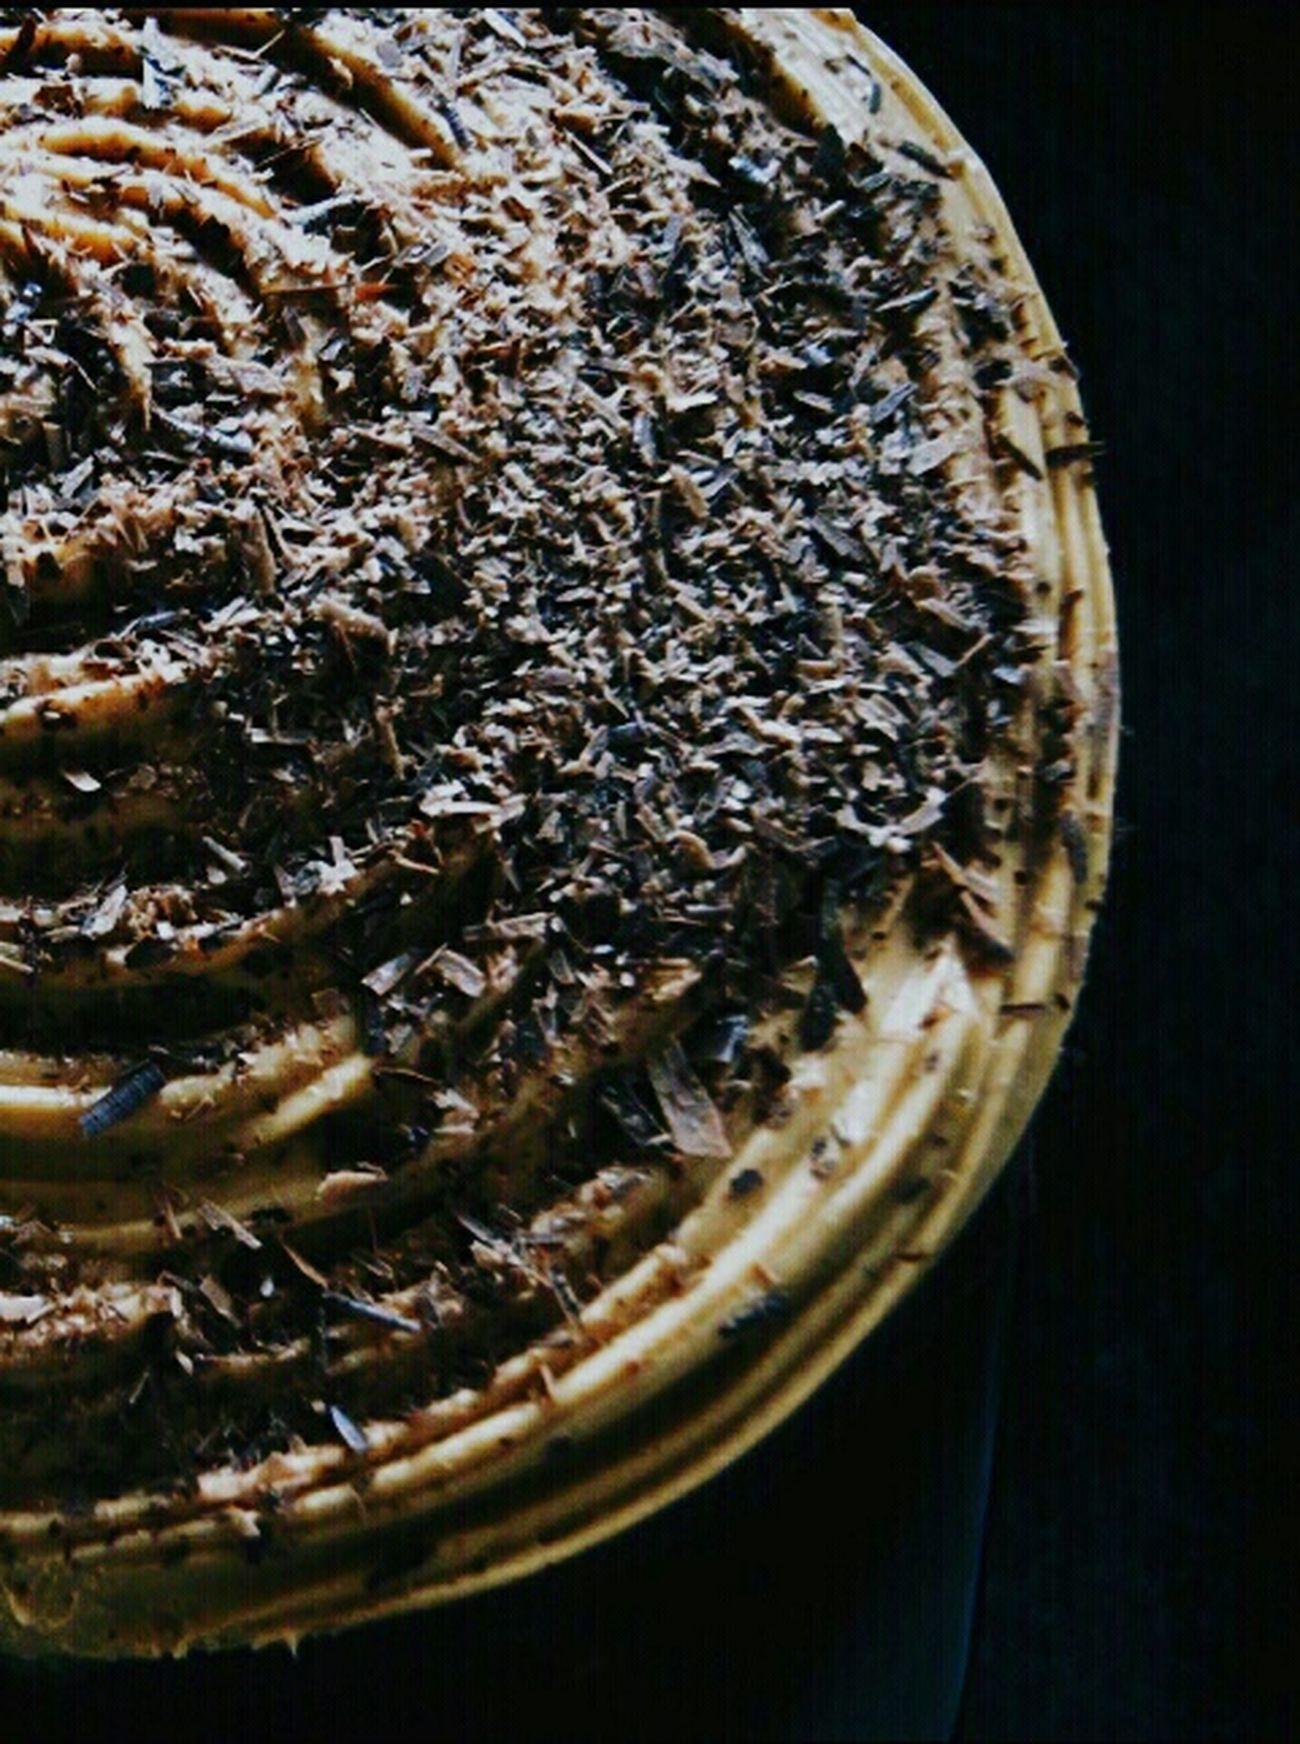 tiramisu cake heaven.. Cake Whatsfordessert Whatsfordinner Southafrica EyeEm Best Shots Notblackandwhite Foodie Delicious Food Inmymouf Creative Light And Shadow Picturing Individuality Mybestphoto2015